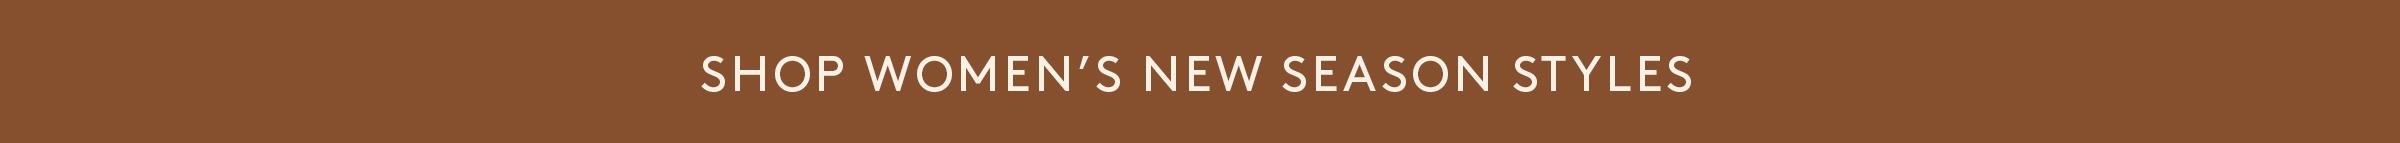 BETTS | Women's | NEW Arrivals | hmpg banner 2400 x 143